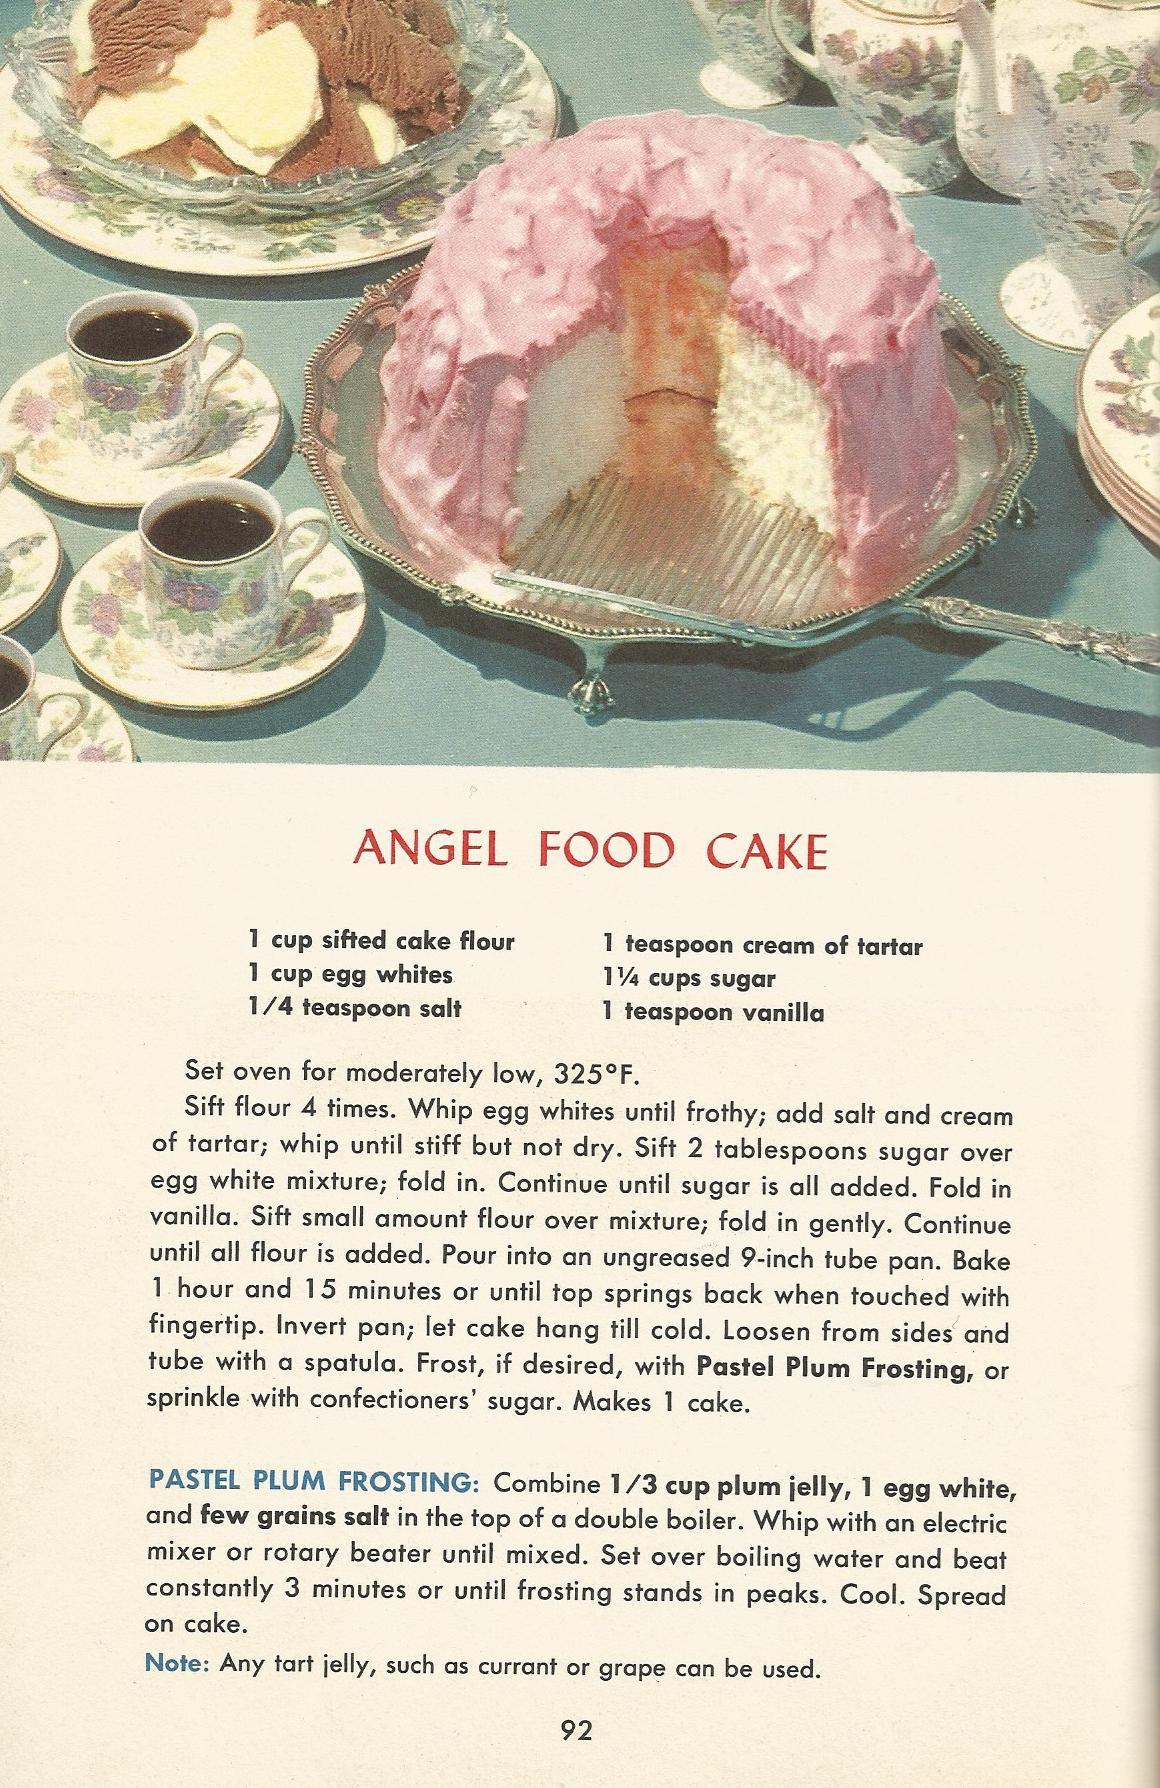 Angel Food Cake Receta